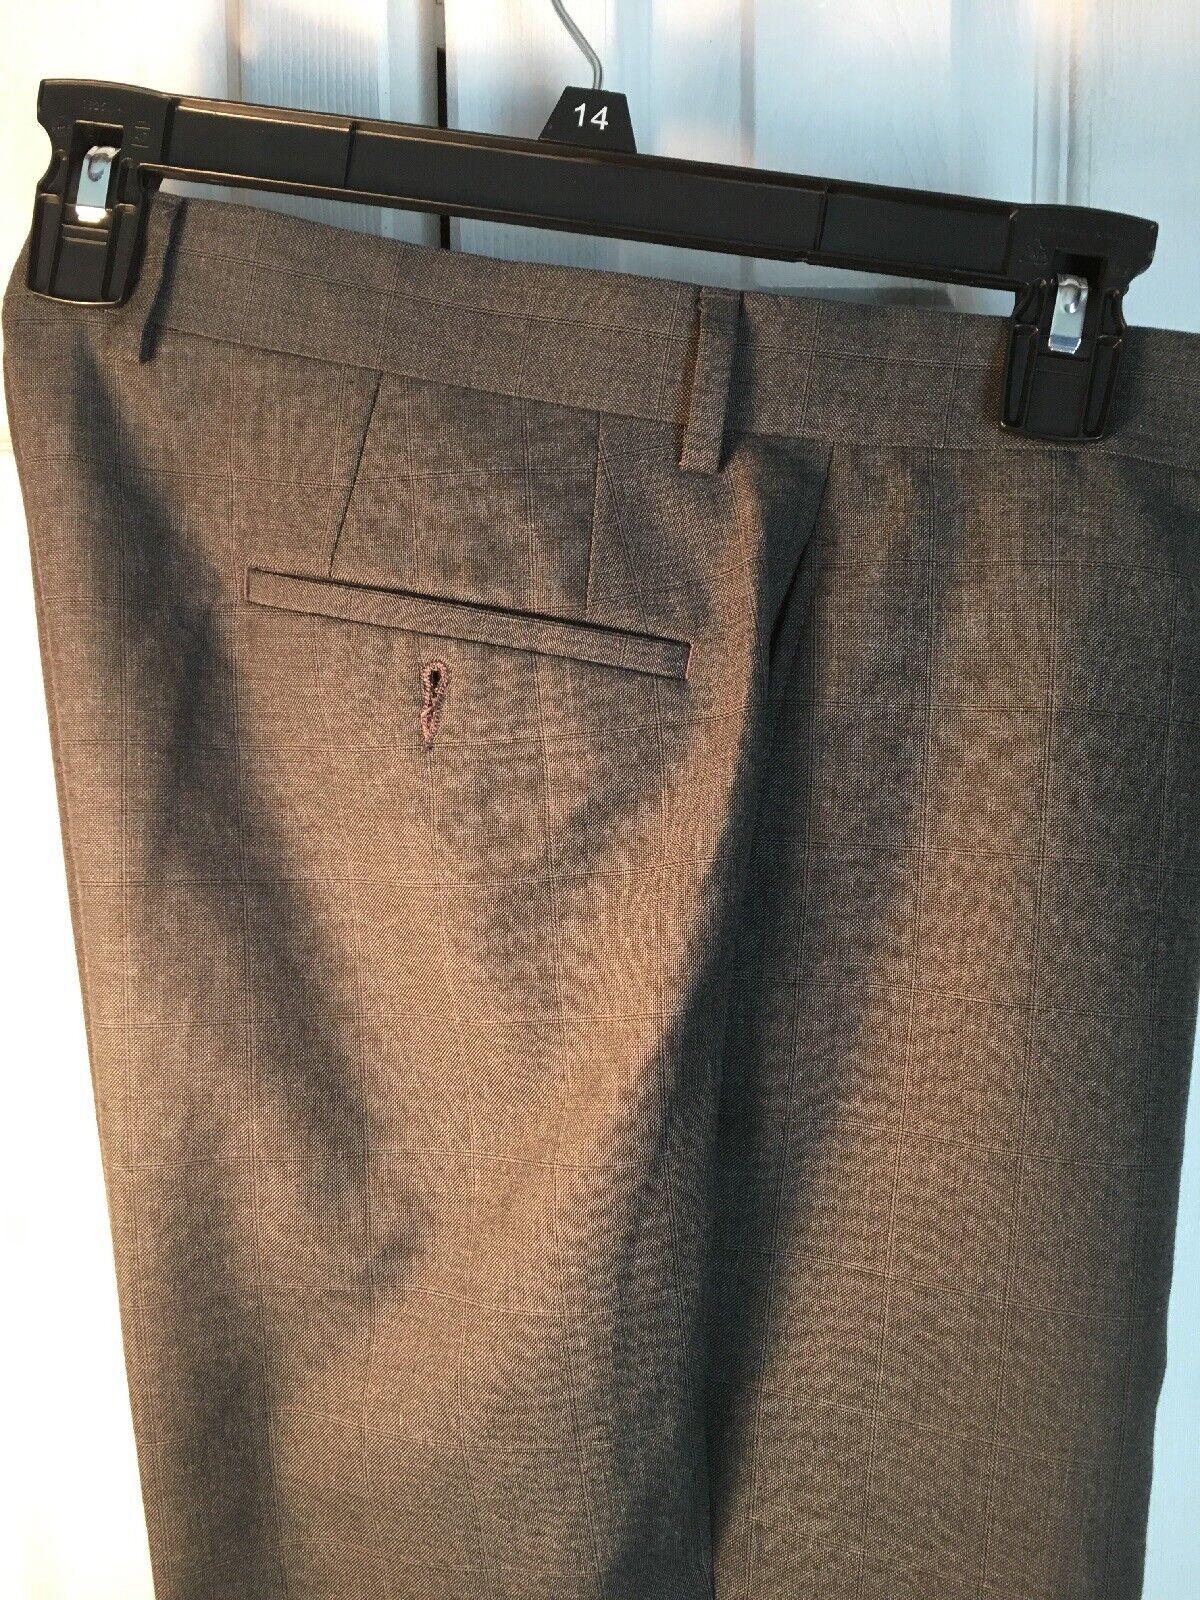 New Ralph Lauren Dress Pants 34x30